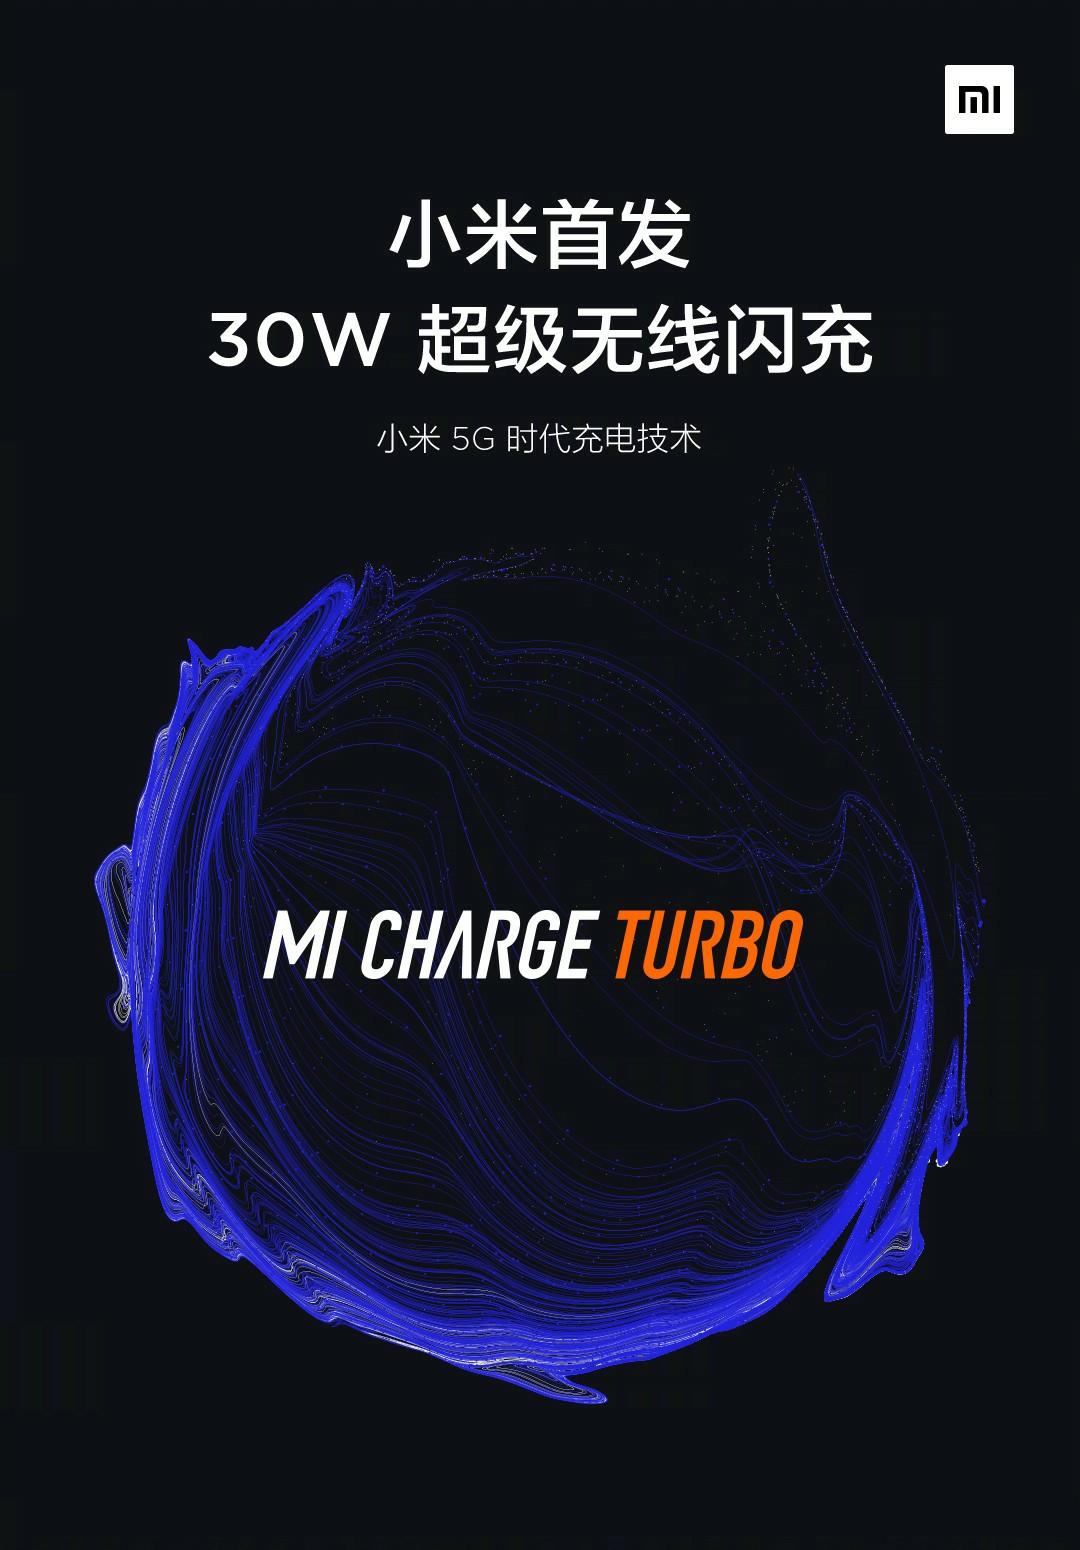 MI CHARGE TURBO, xiaomi 30w wireless charger,